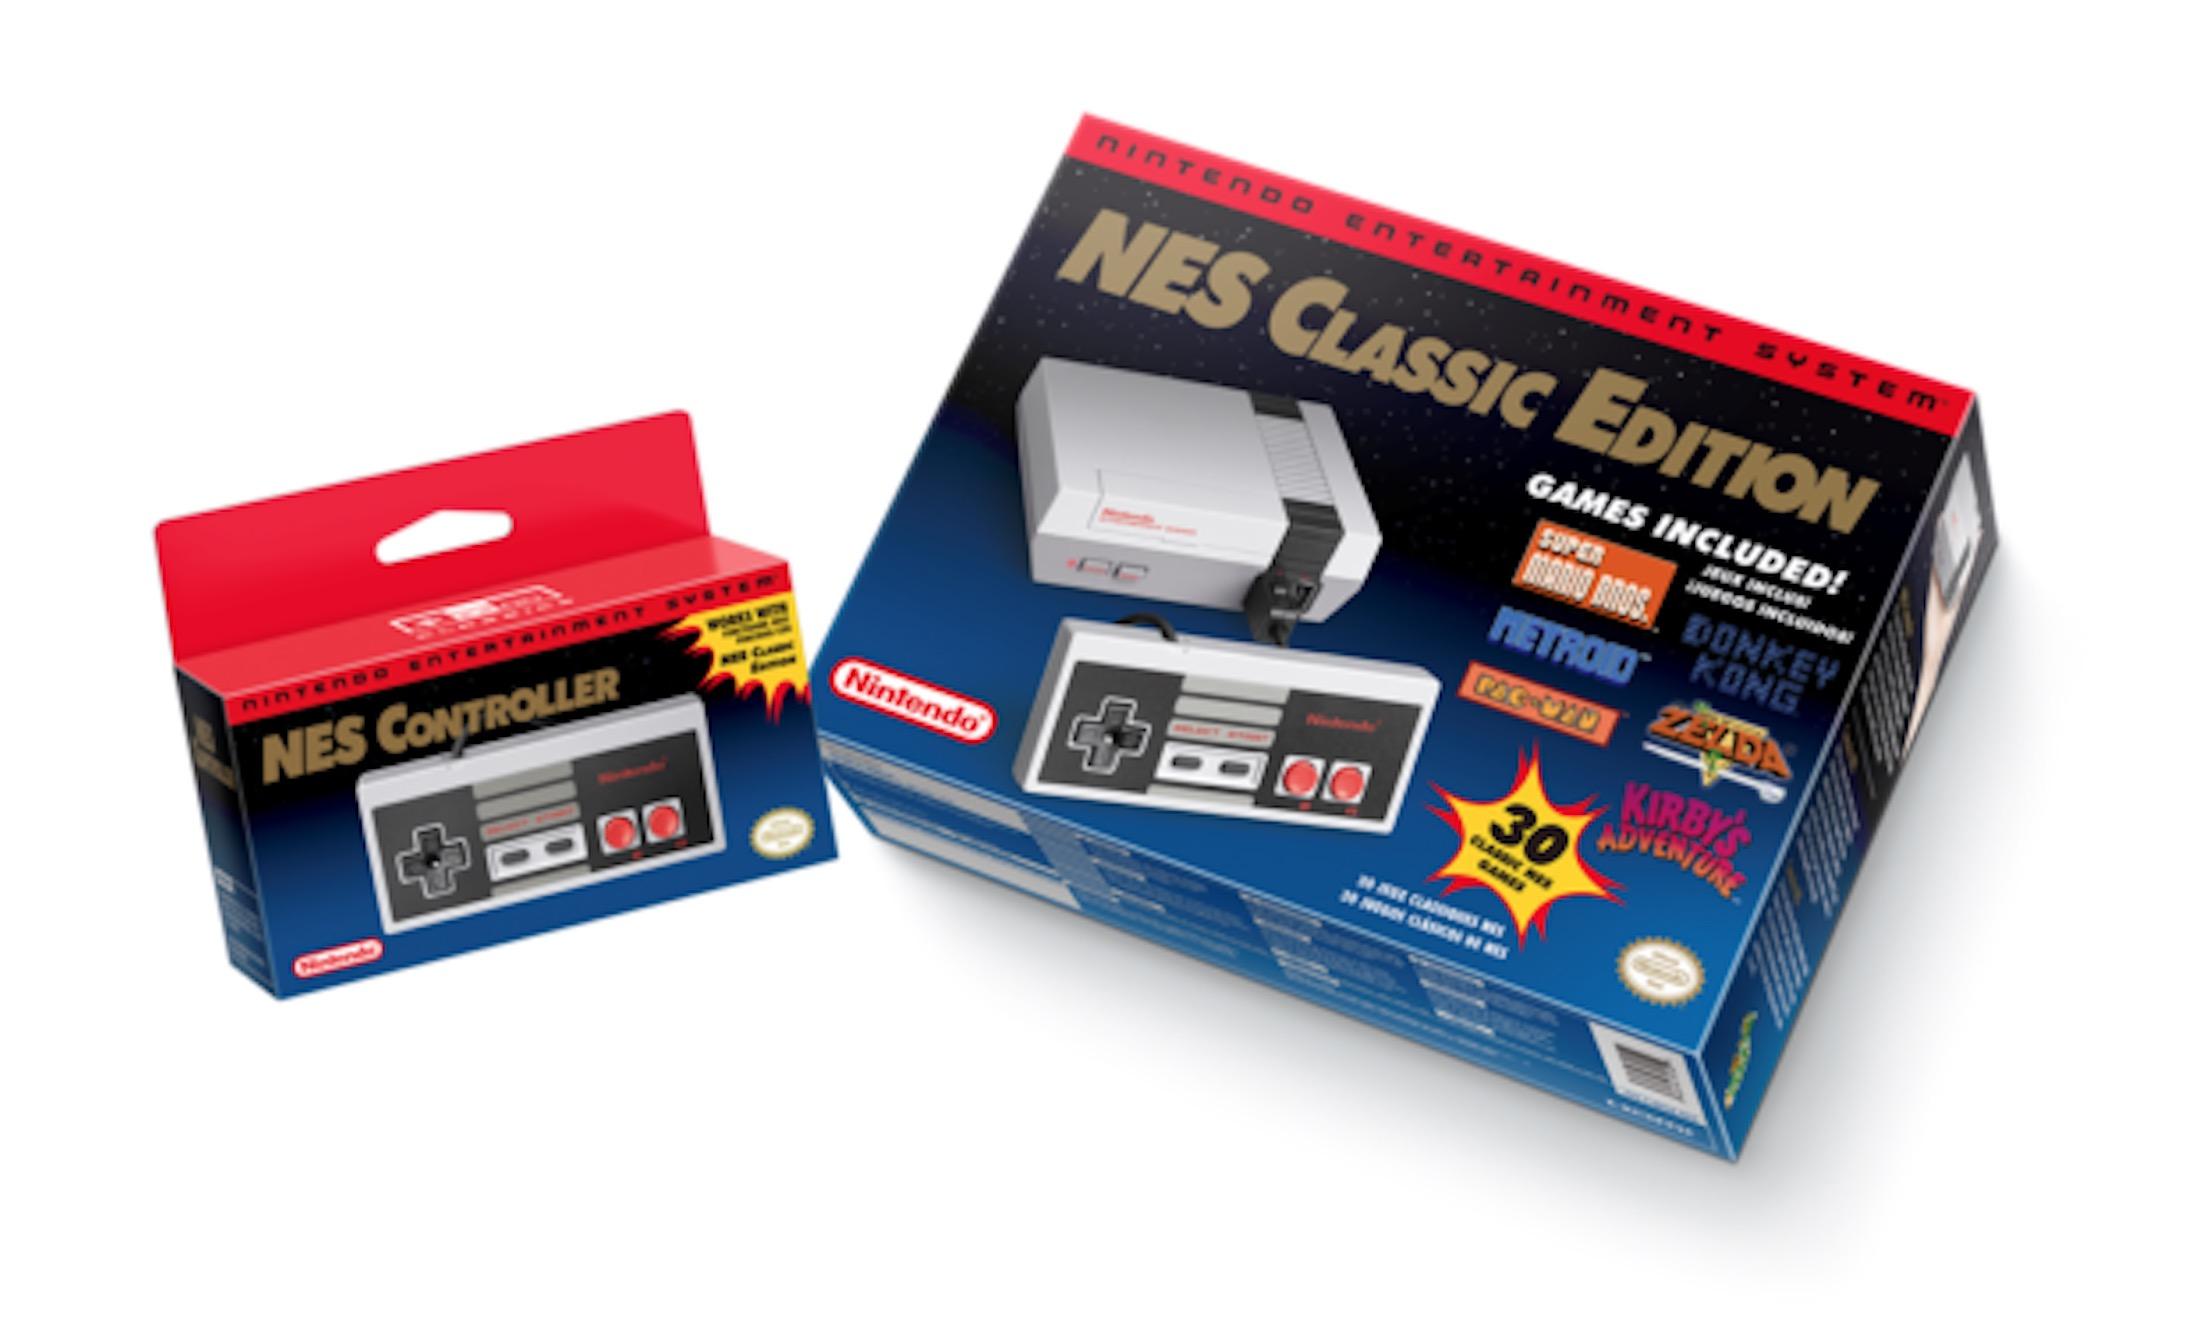 NES-Classic-Edition-Boxart-Control-Crop